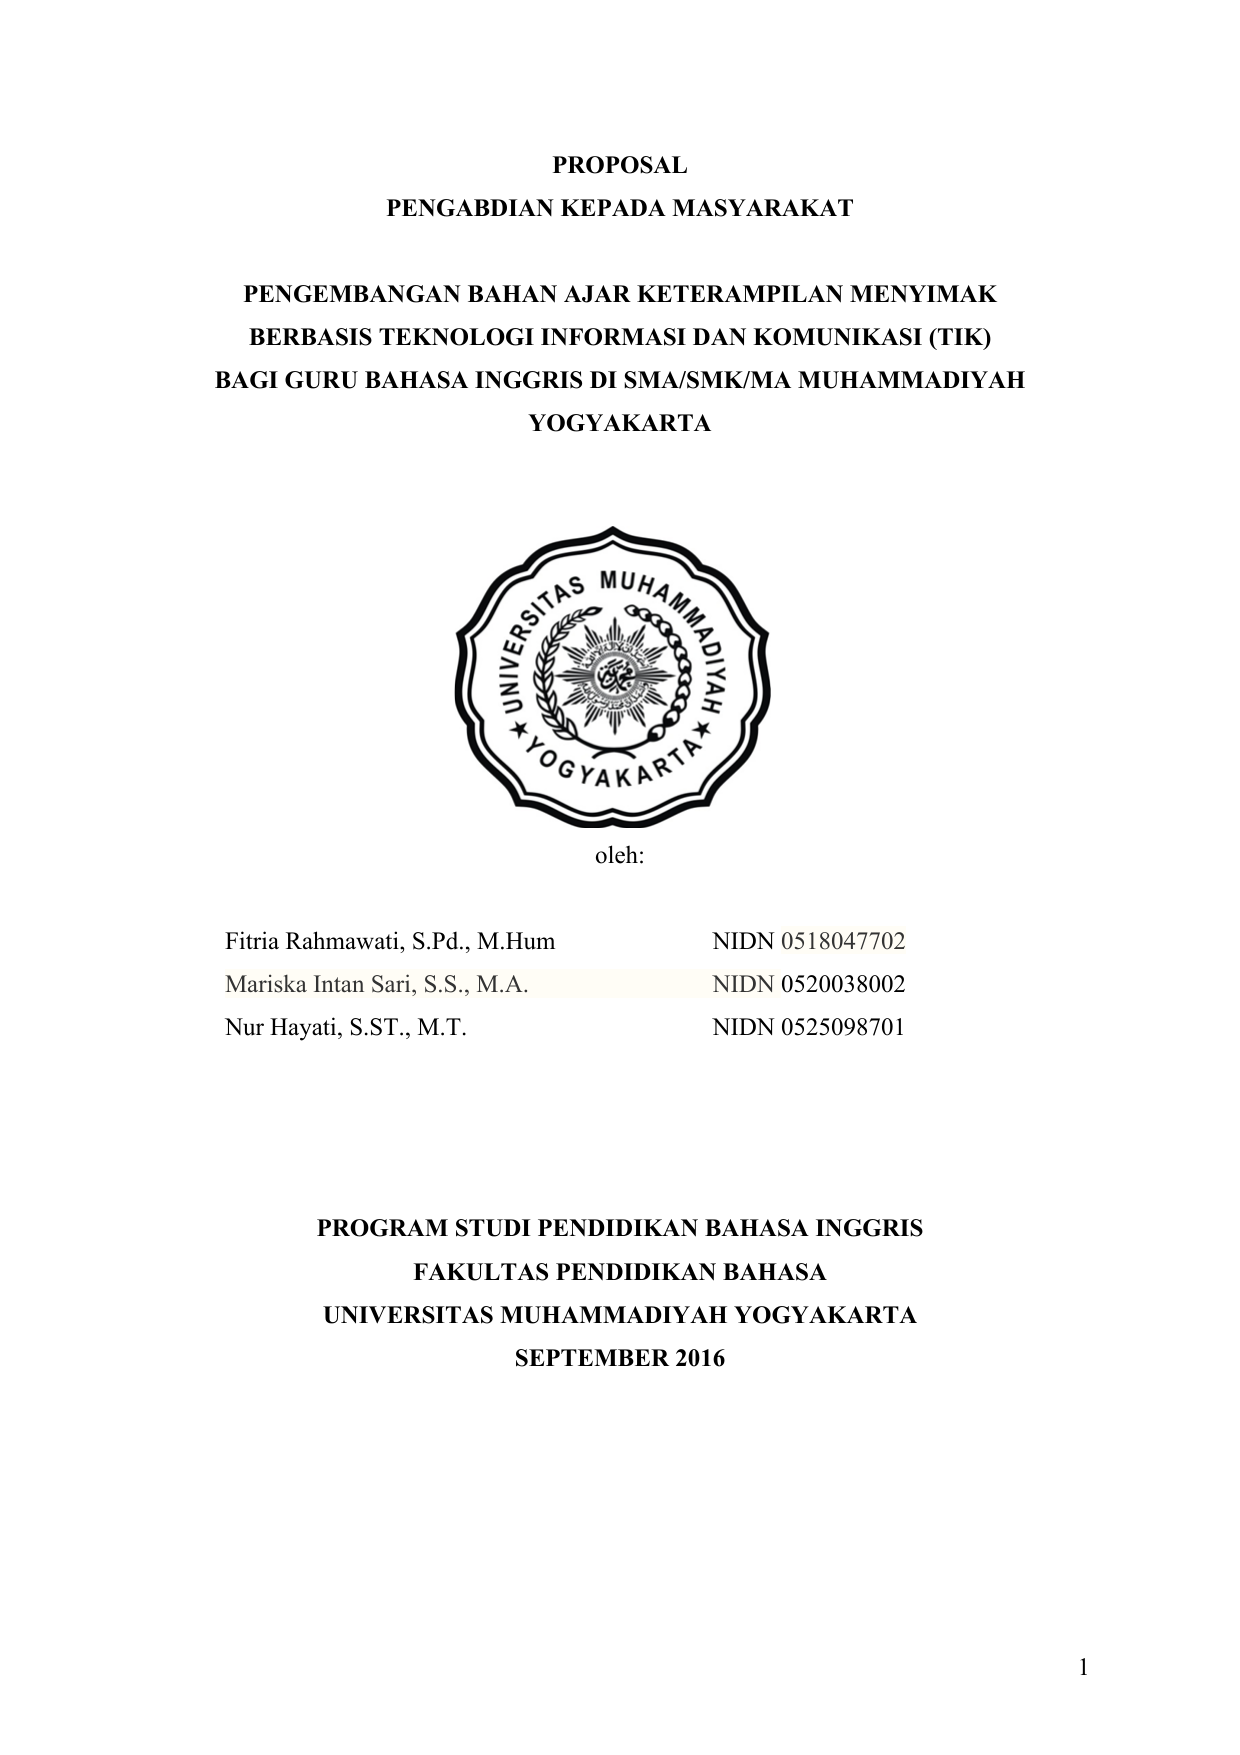 Proposal Pkm Pengembangan Bahan Ajar